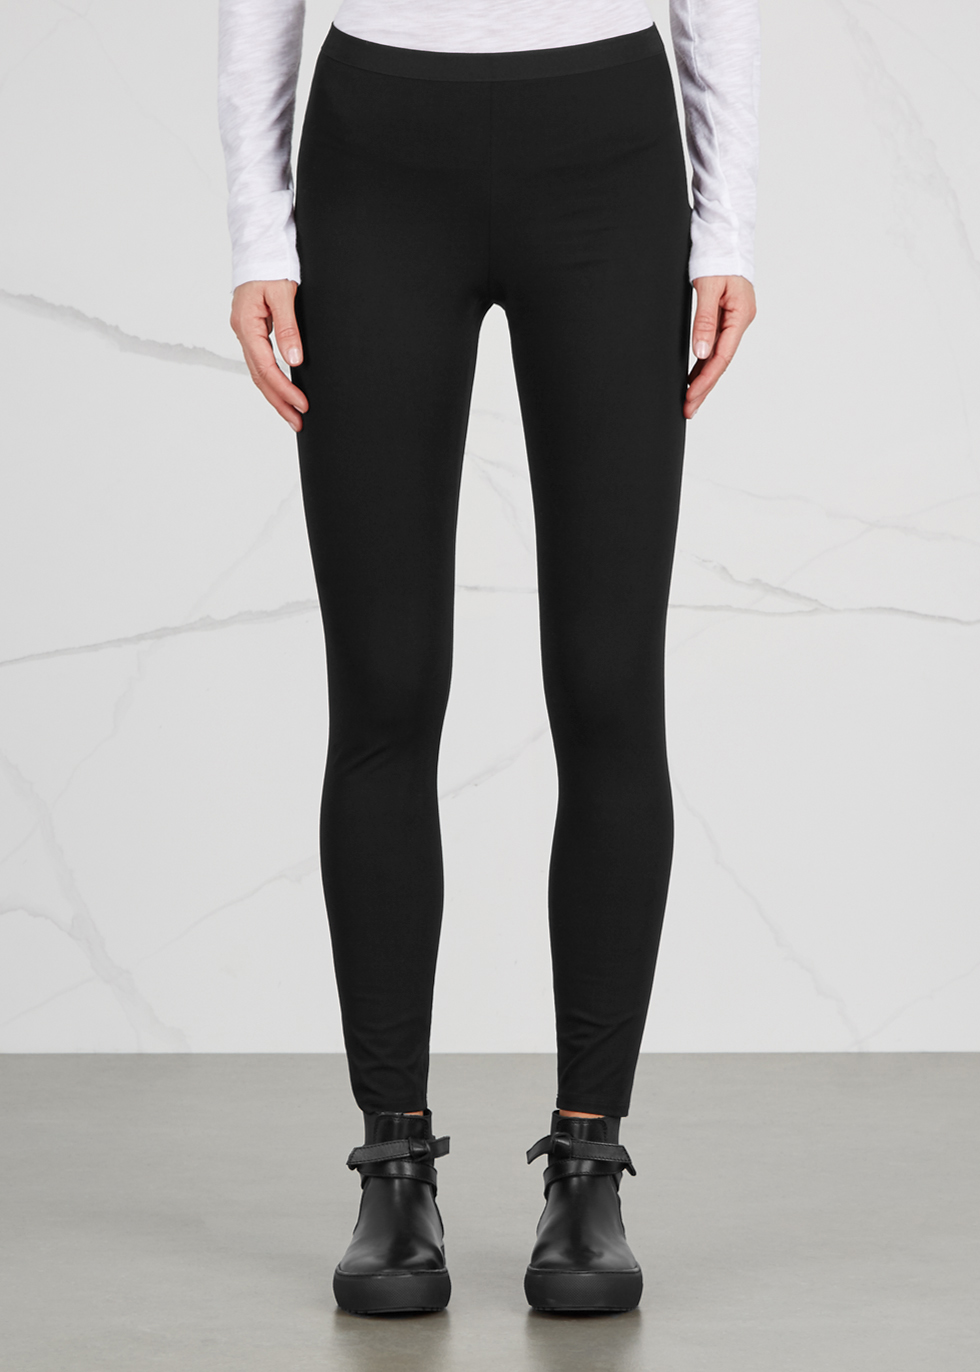 Reflex black jersey leggings - Helmut Lang